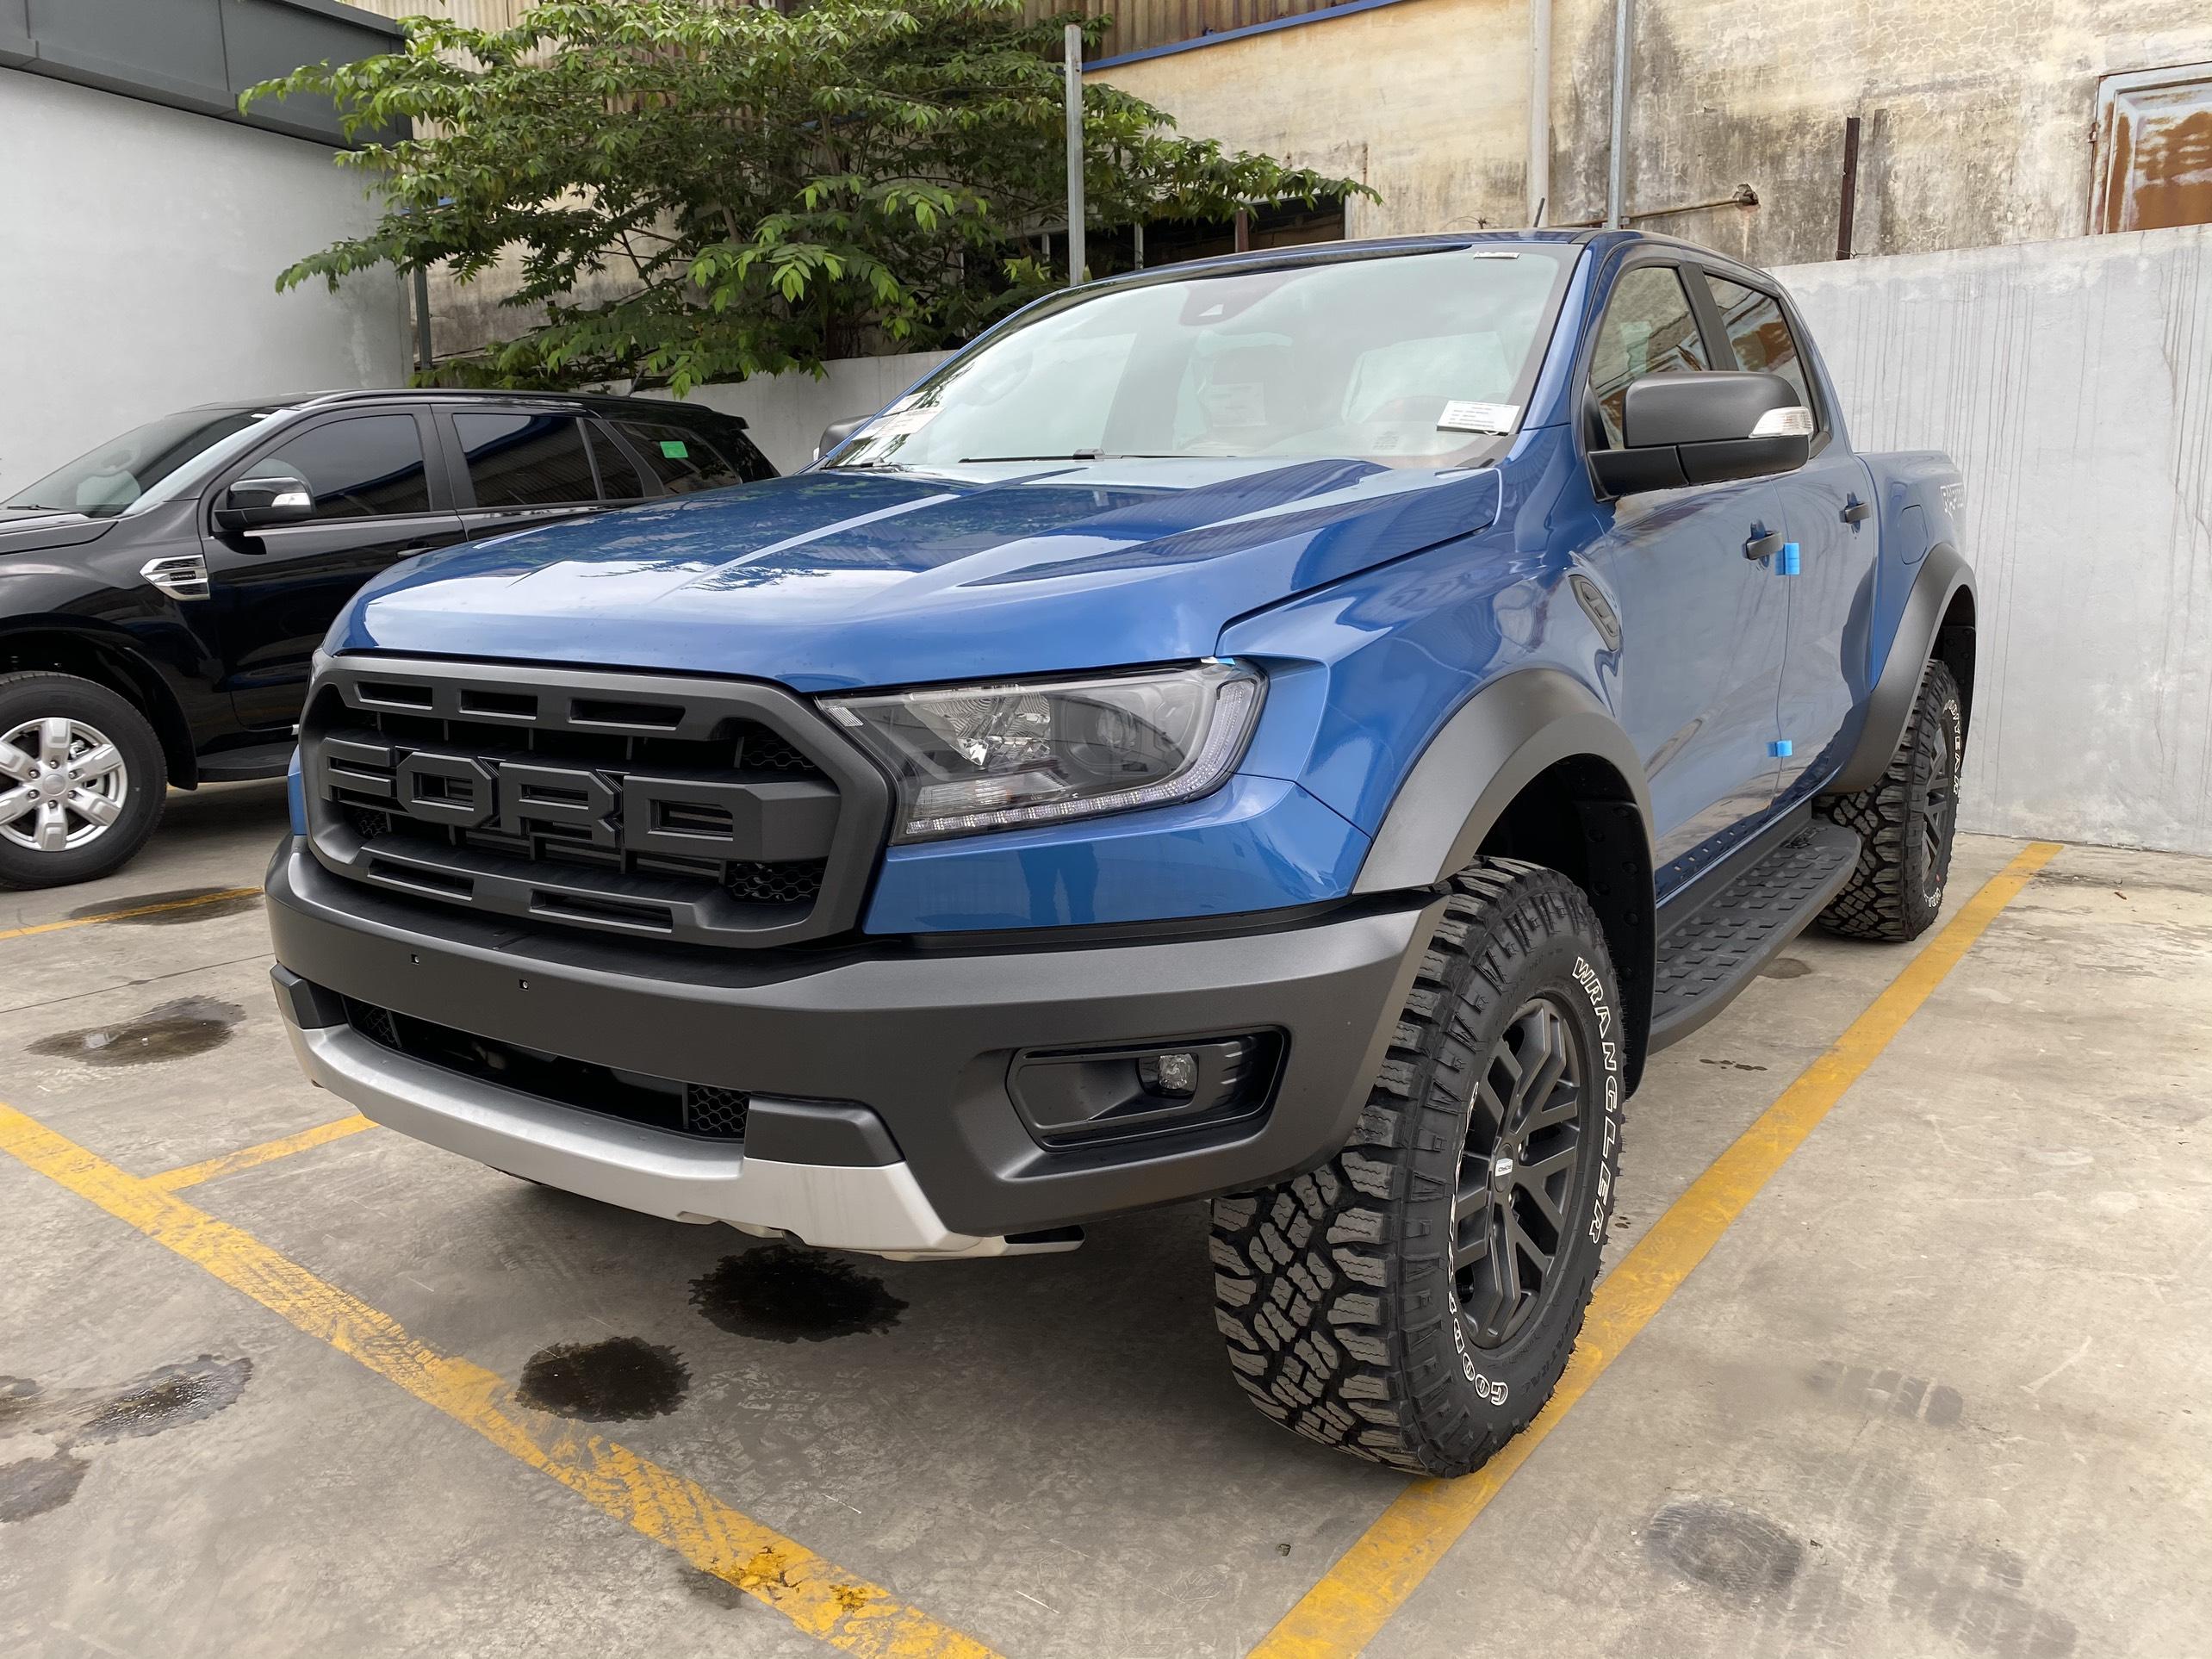 Ranger Raptor mới